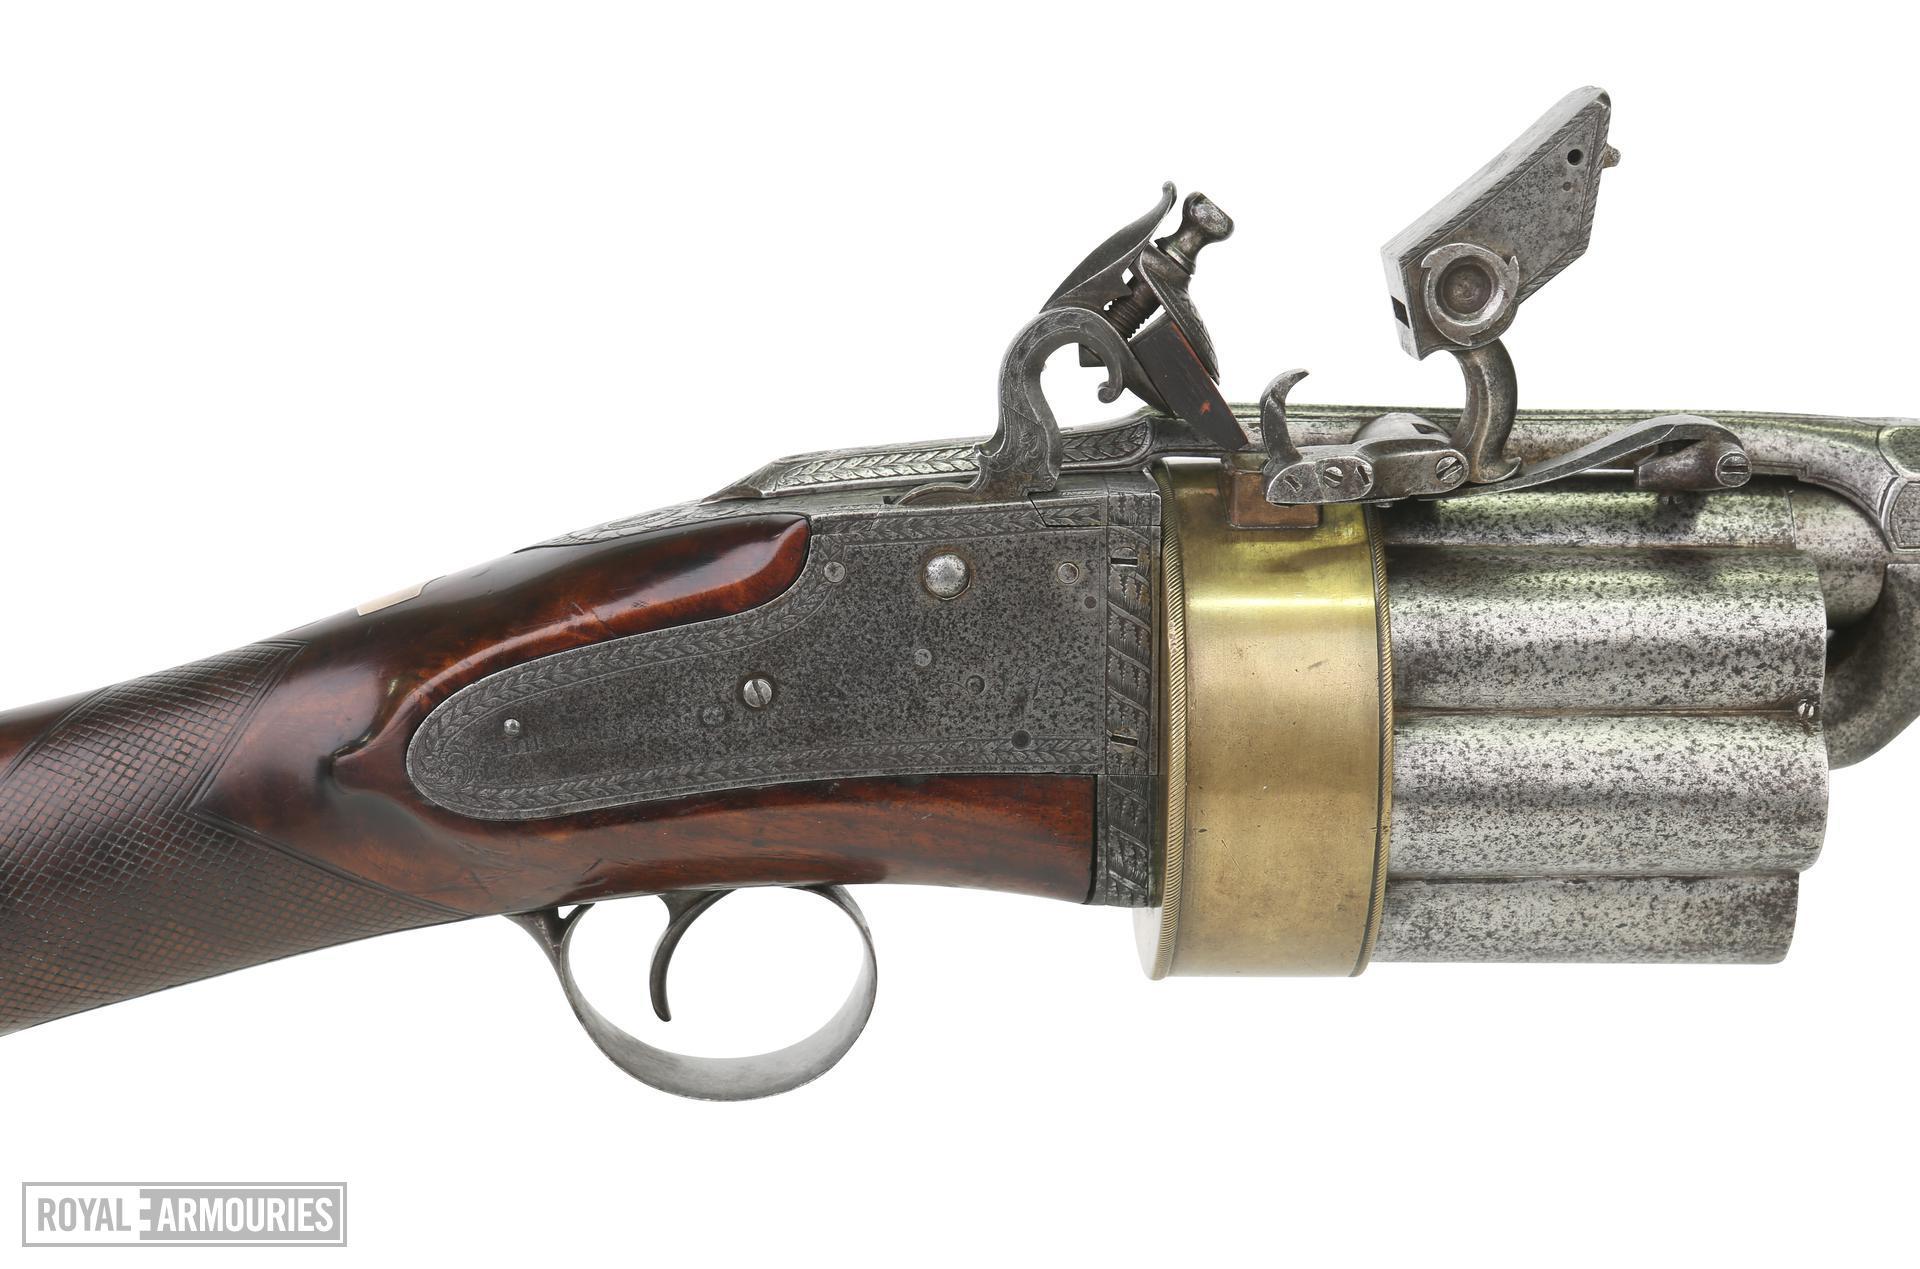 Flintlock revolver gun, Using Colliers's principle of a revolver with seven shots. XII.1503